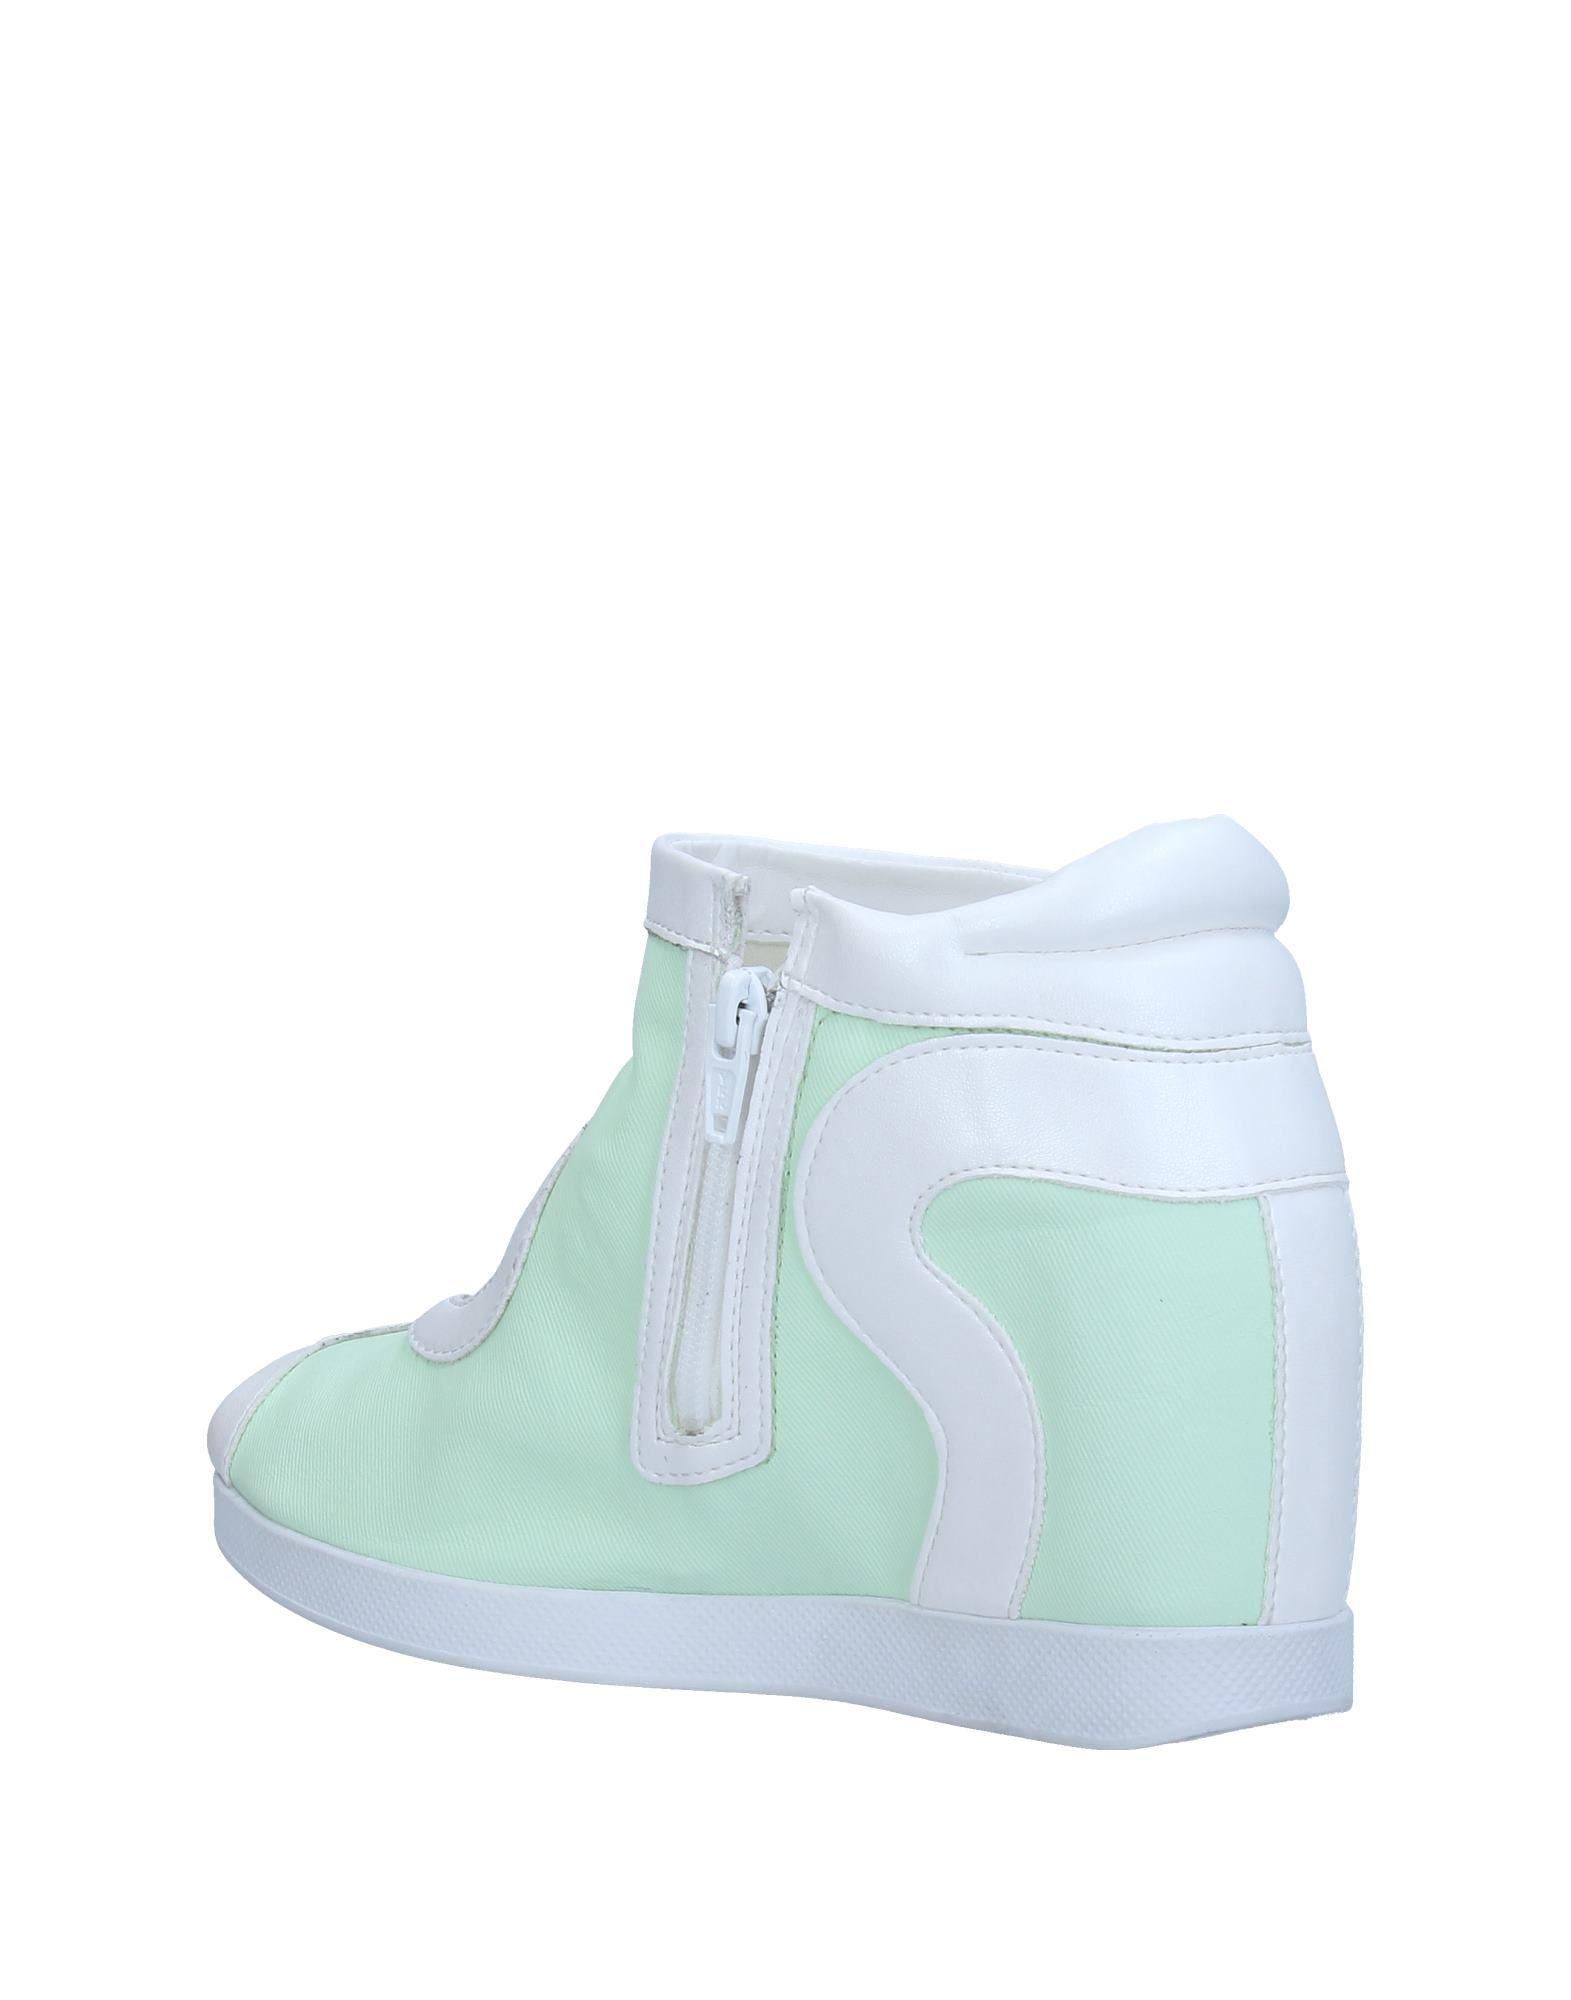 Ruco Line Sneakers Damen  11334338LE Gute Qualität beliebte Schuhe